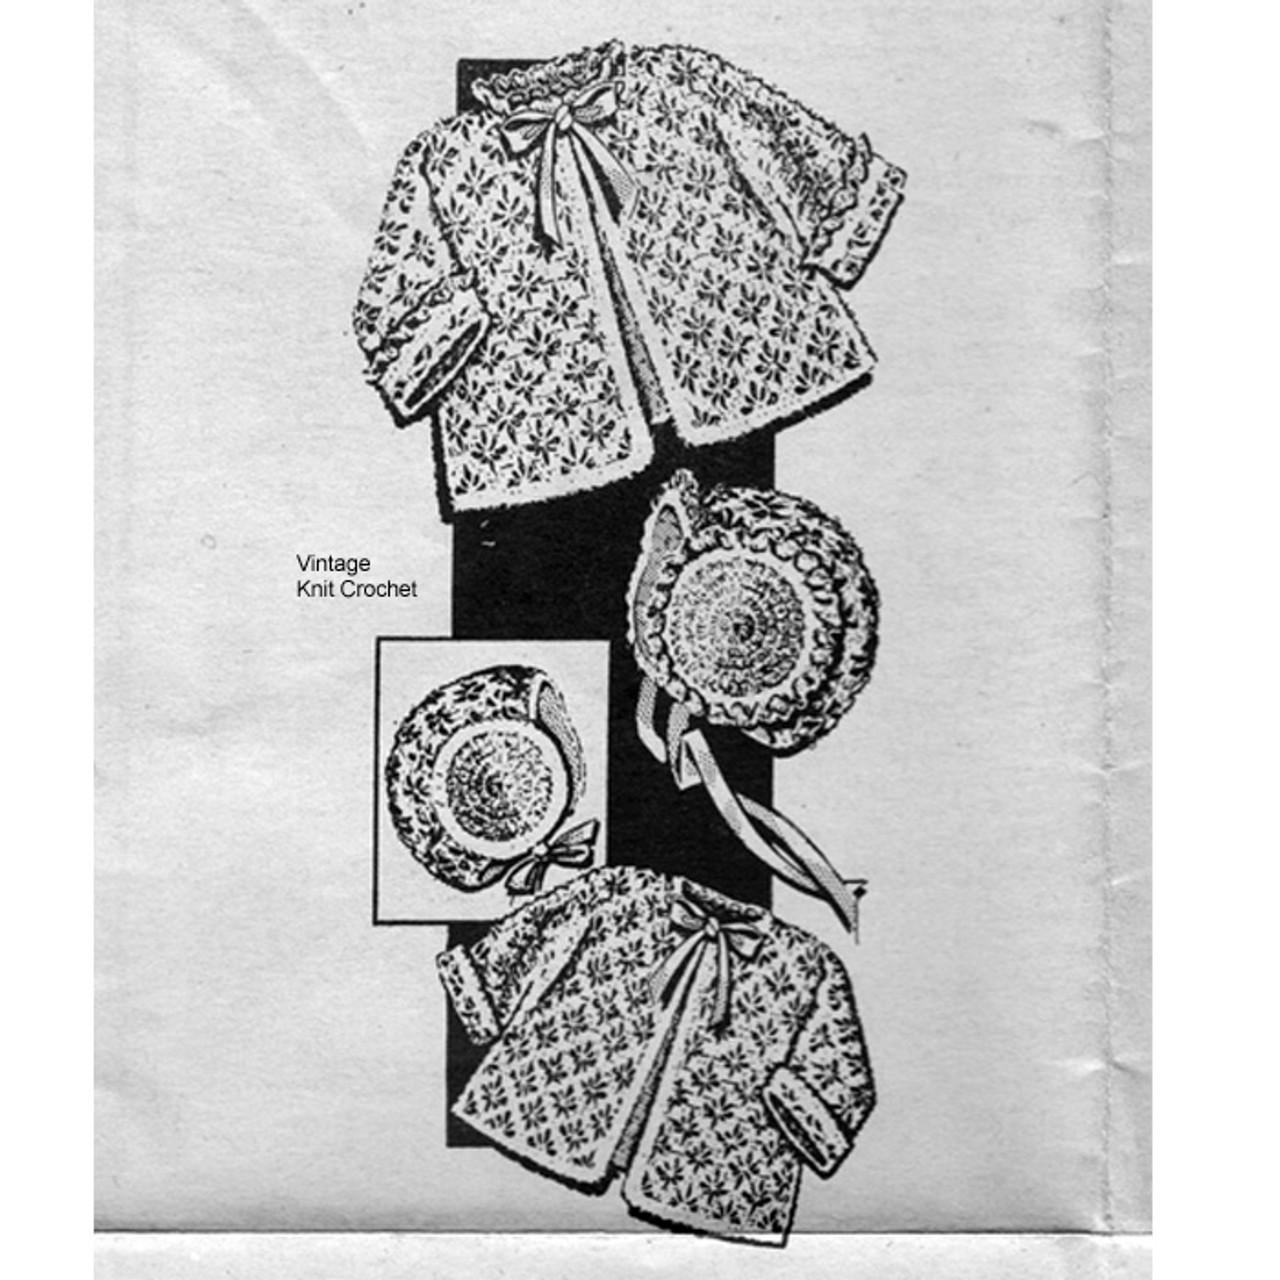 Mail Order Crochet Baby Jacket Pattern in spider web stitch, Alice Brooks 7252